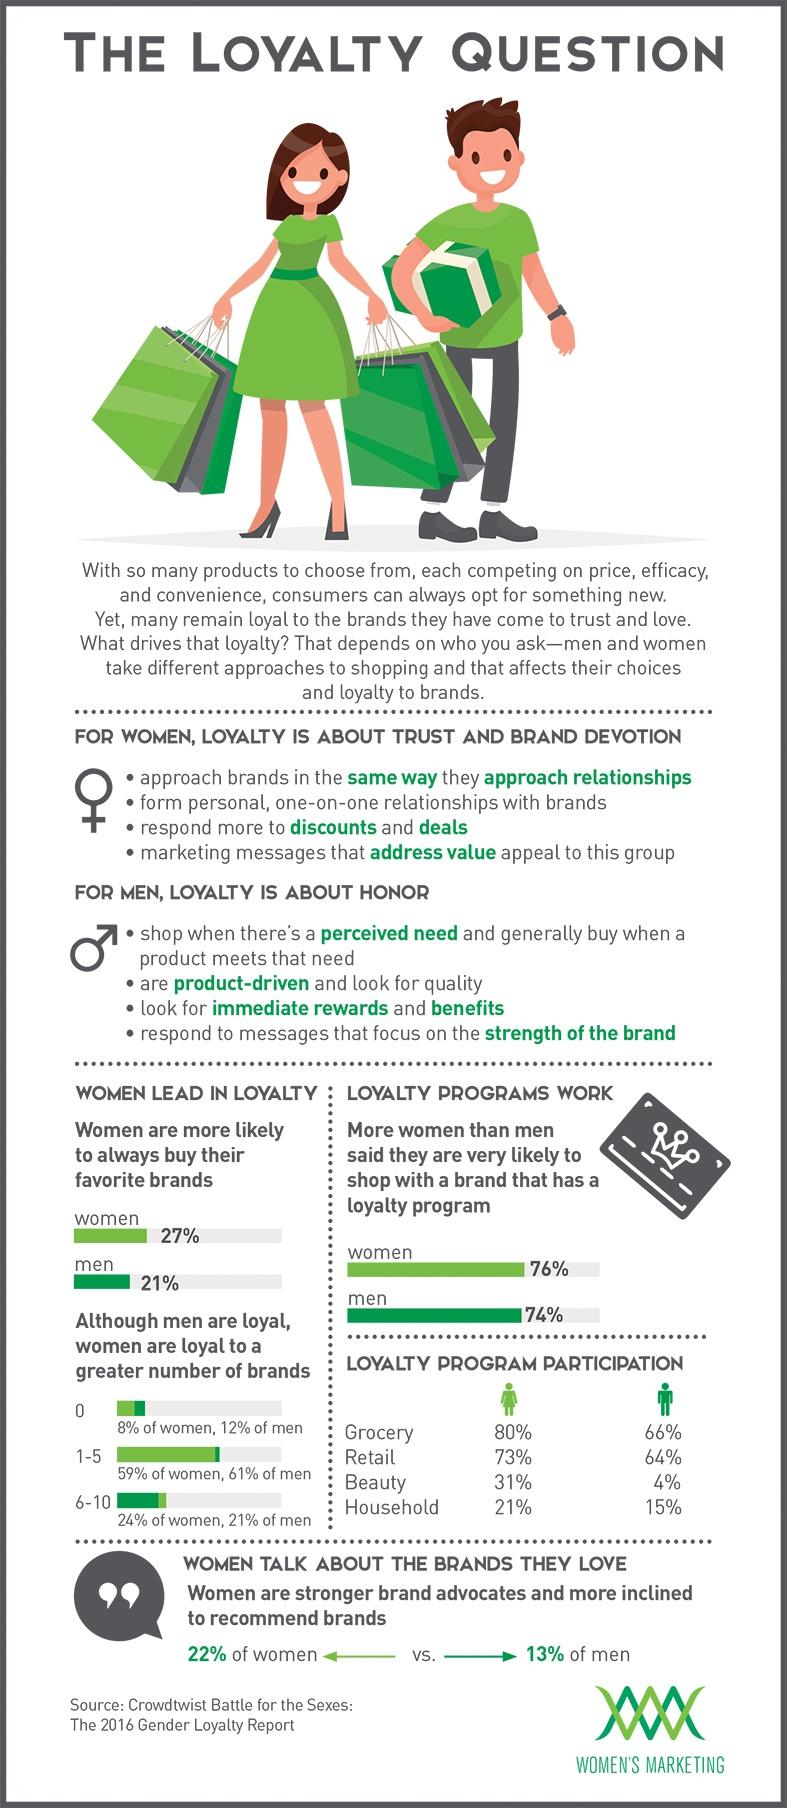 LoyaltyQuestion_Infographic.jpg